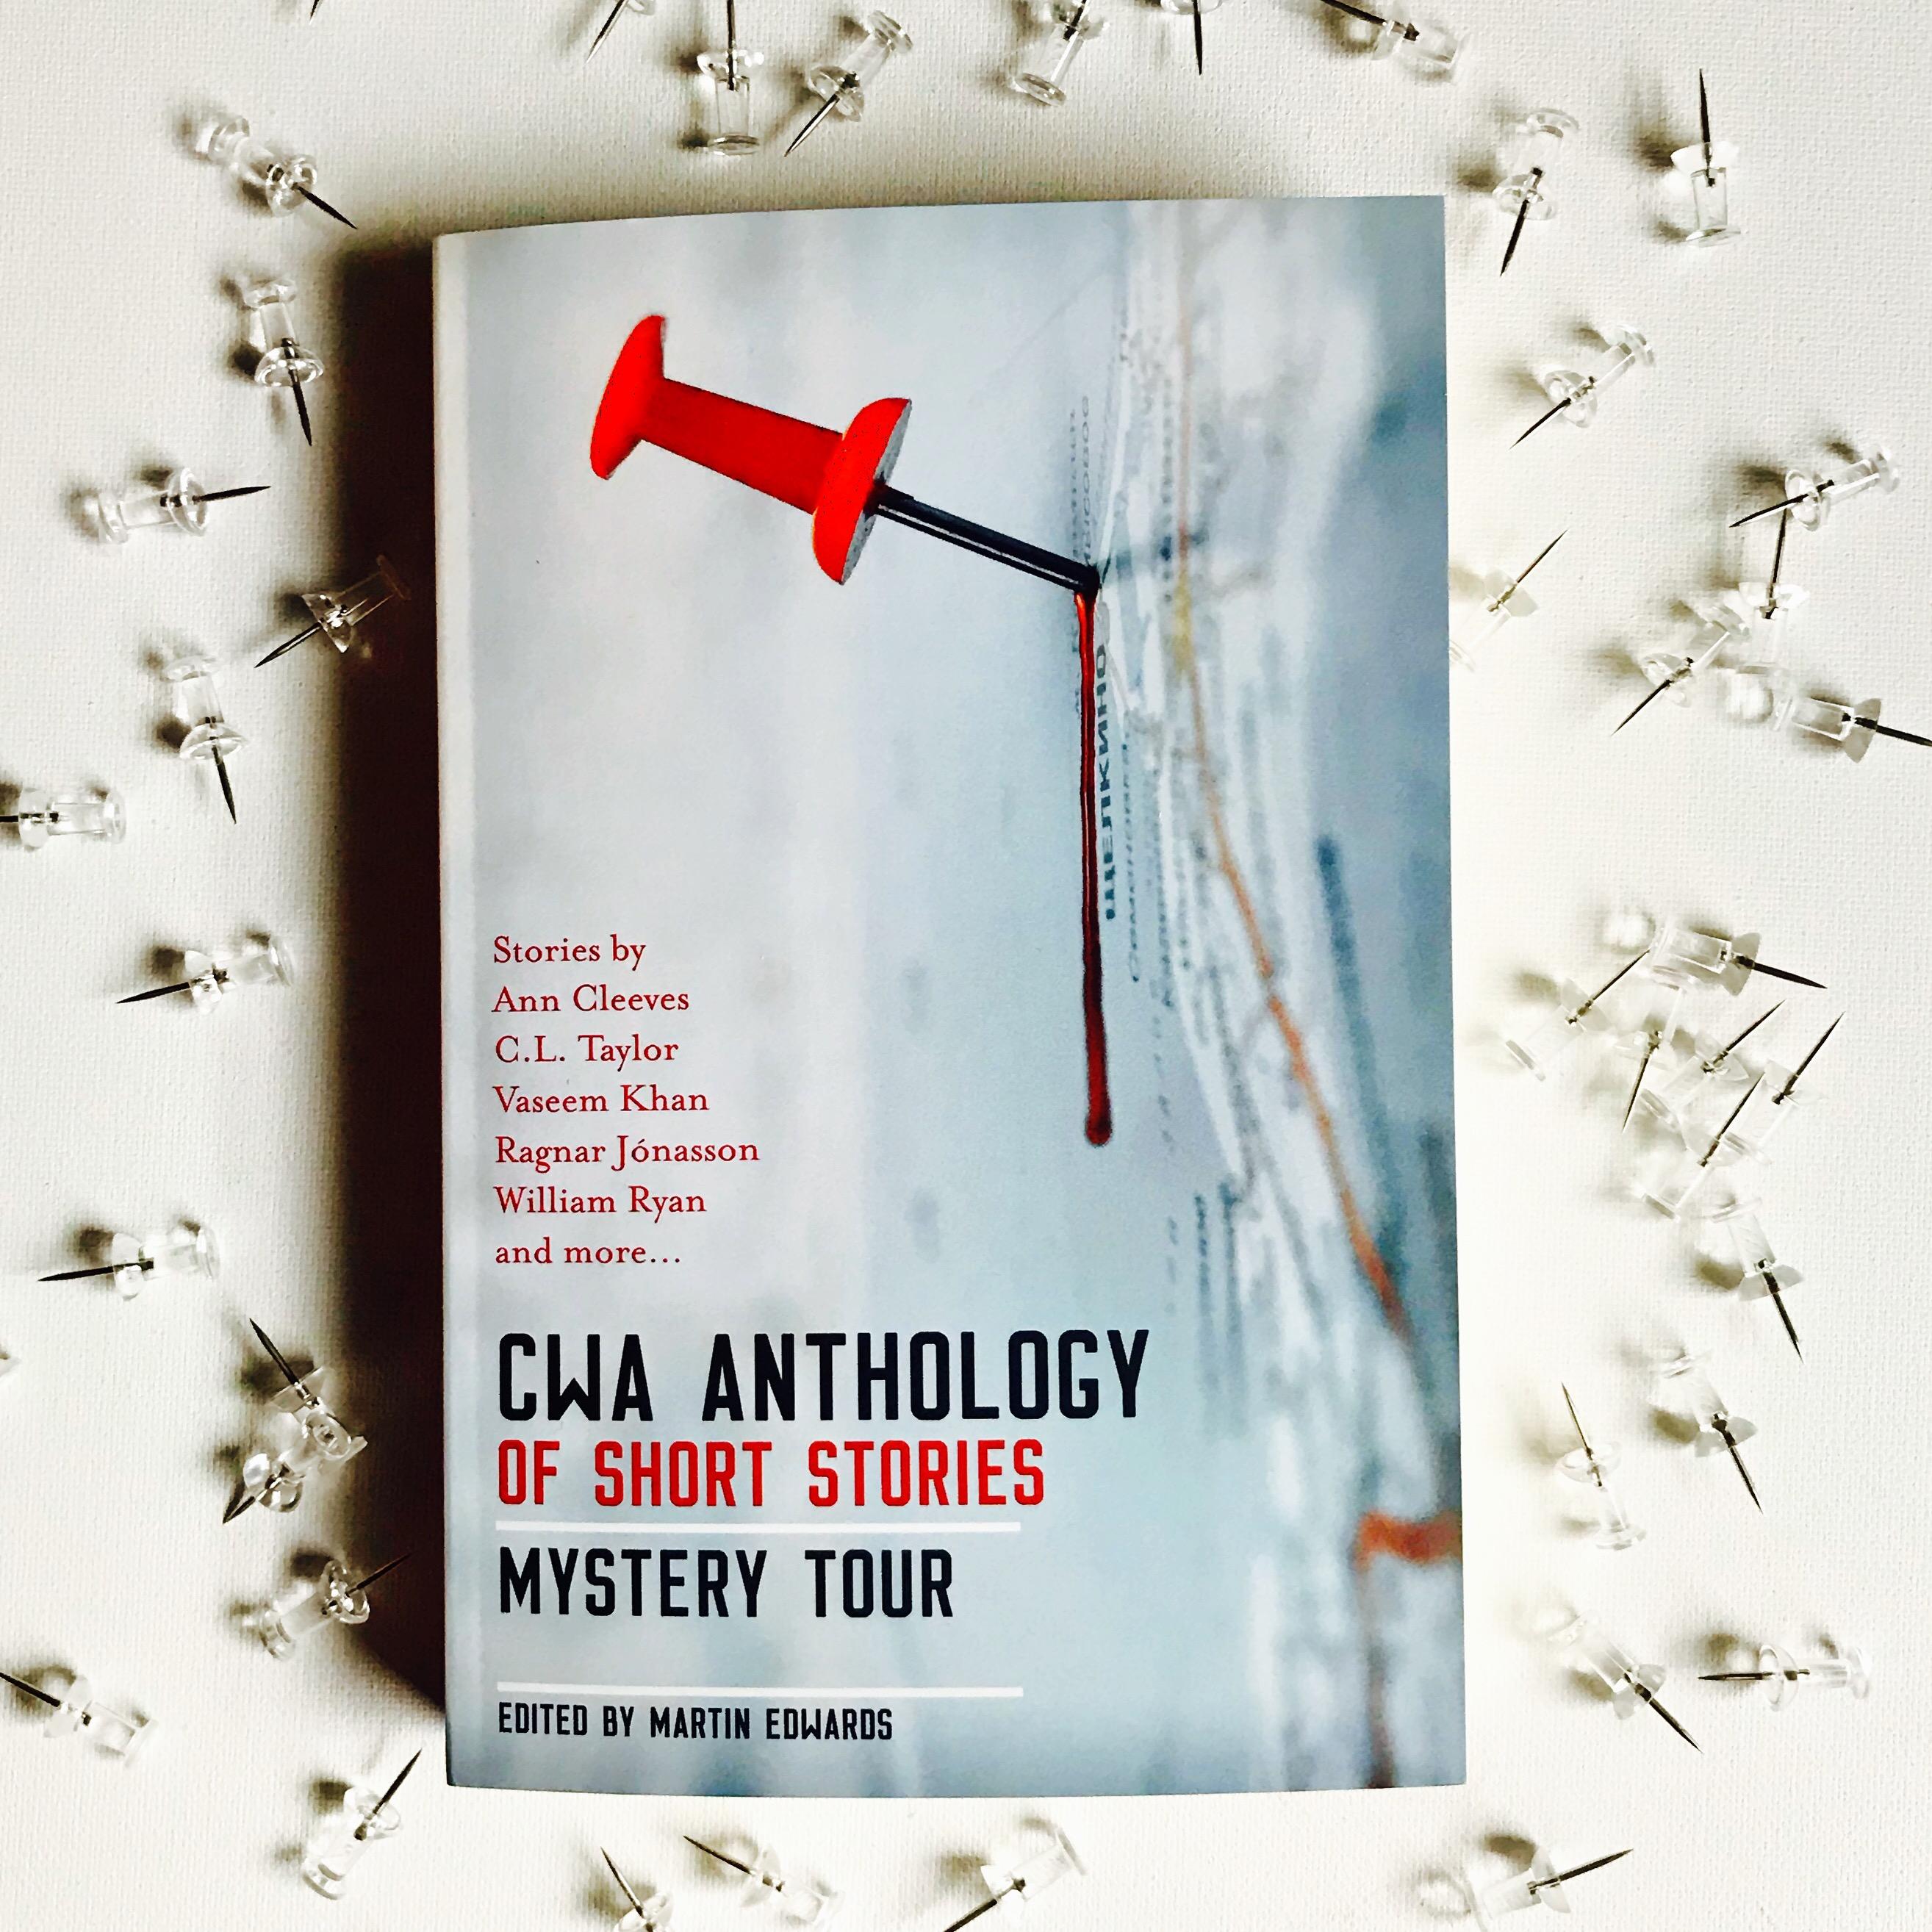 Short Stories Anthologies: Orenda Book Mail: CWA ANTHOLOGY OF SHORT STORIES: MYSTERY